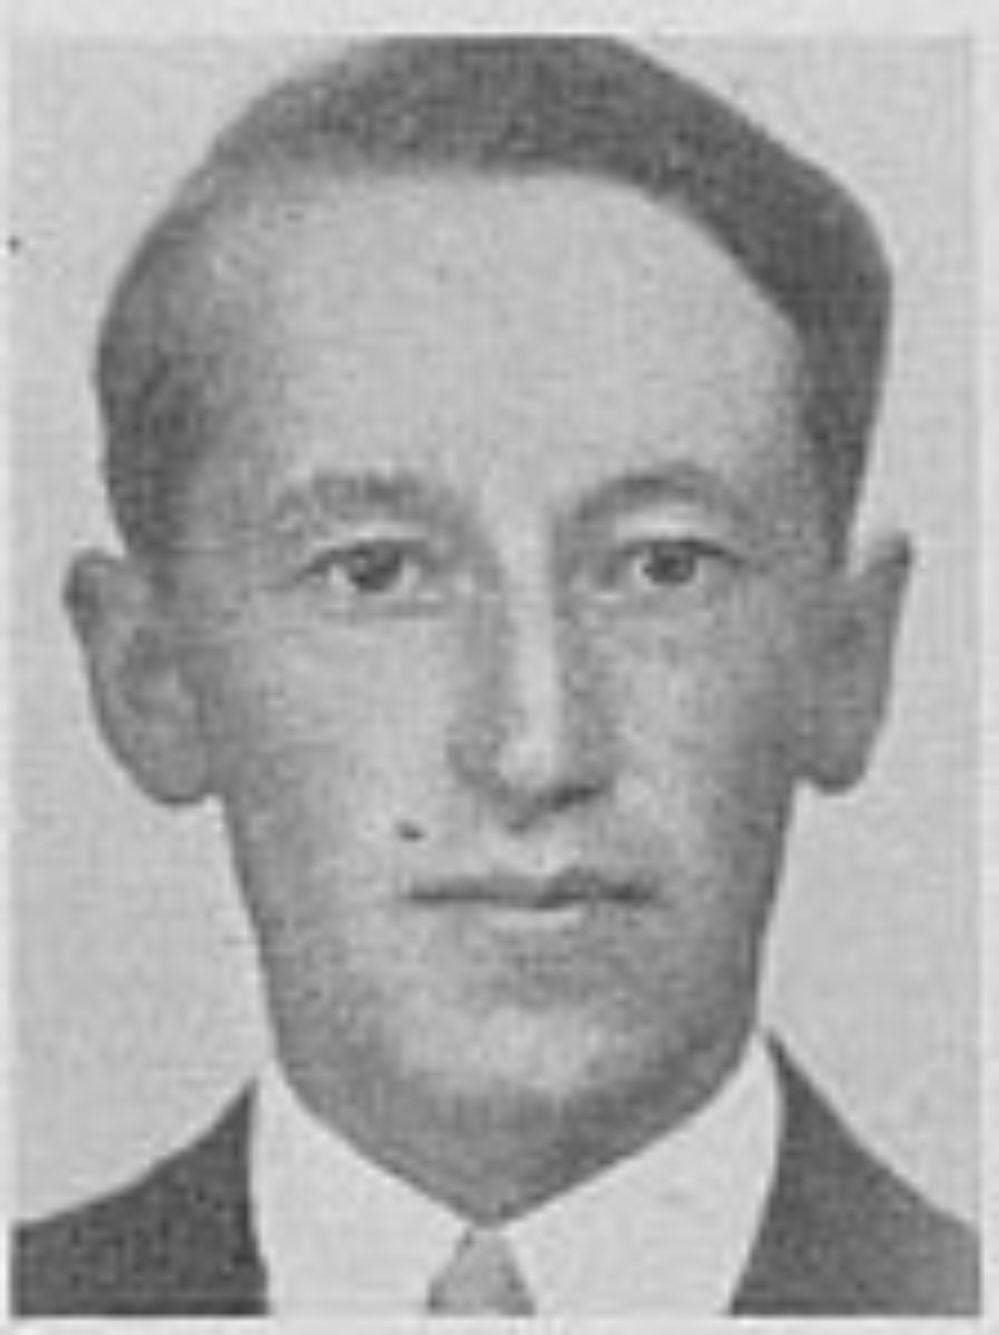 Albert Olai Blåmvågnes